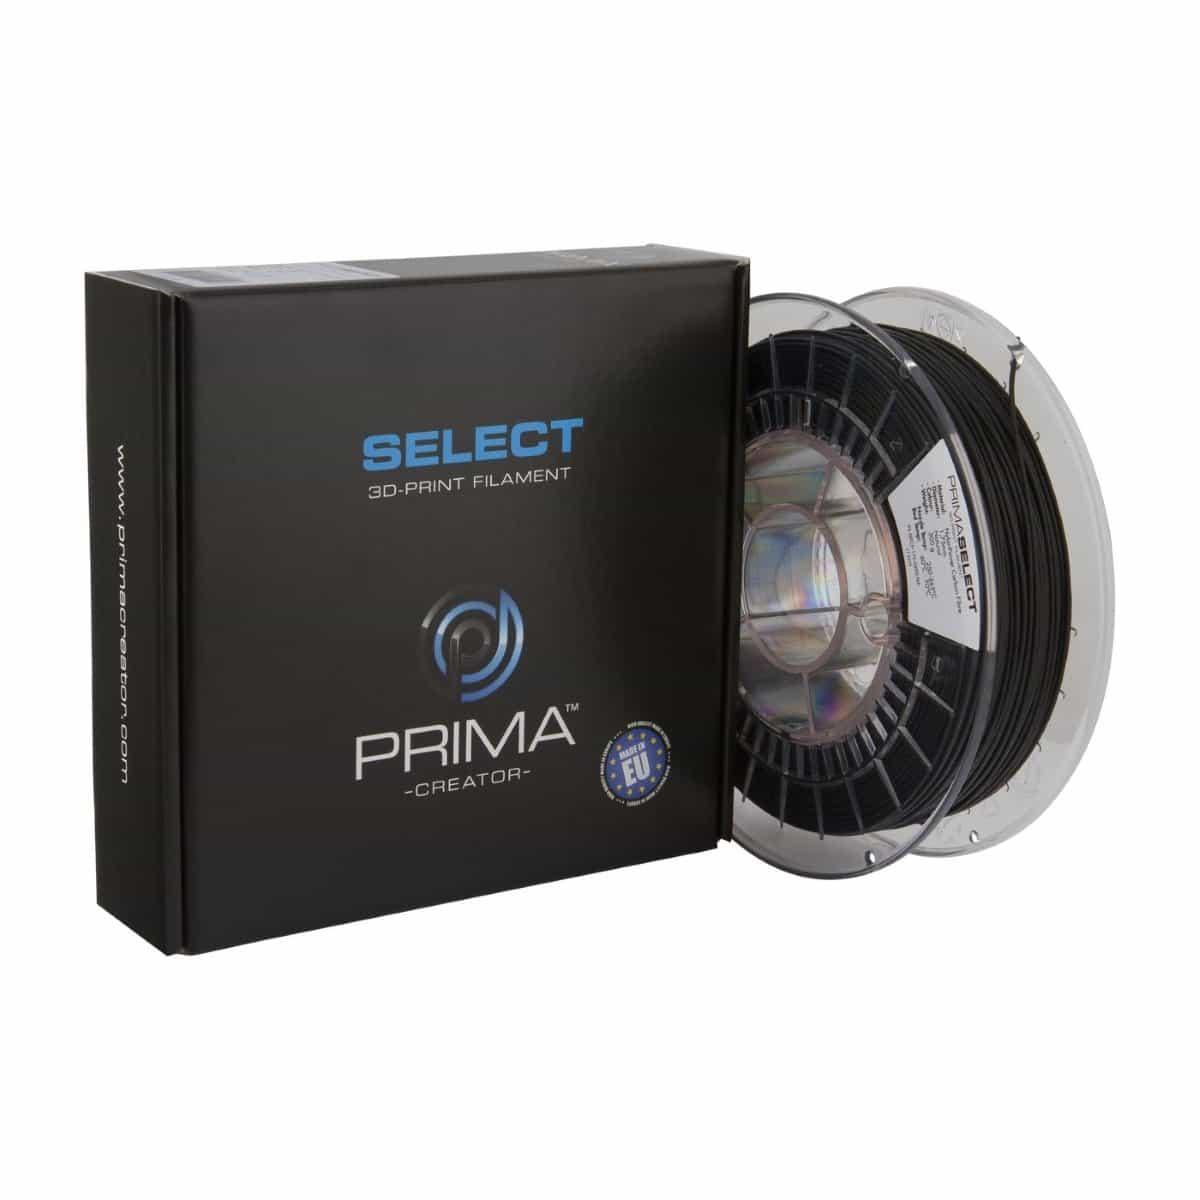 Image of PrimaSelect NylonPower Carbon Fibre - 1.75mm - 500g - Natural - Black